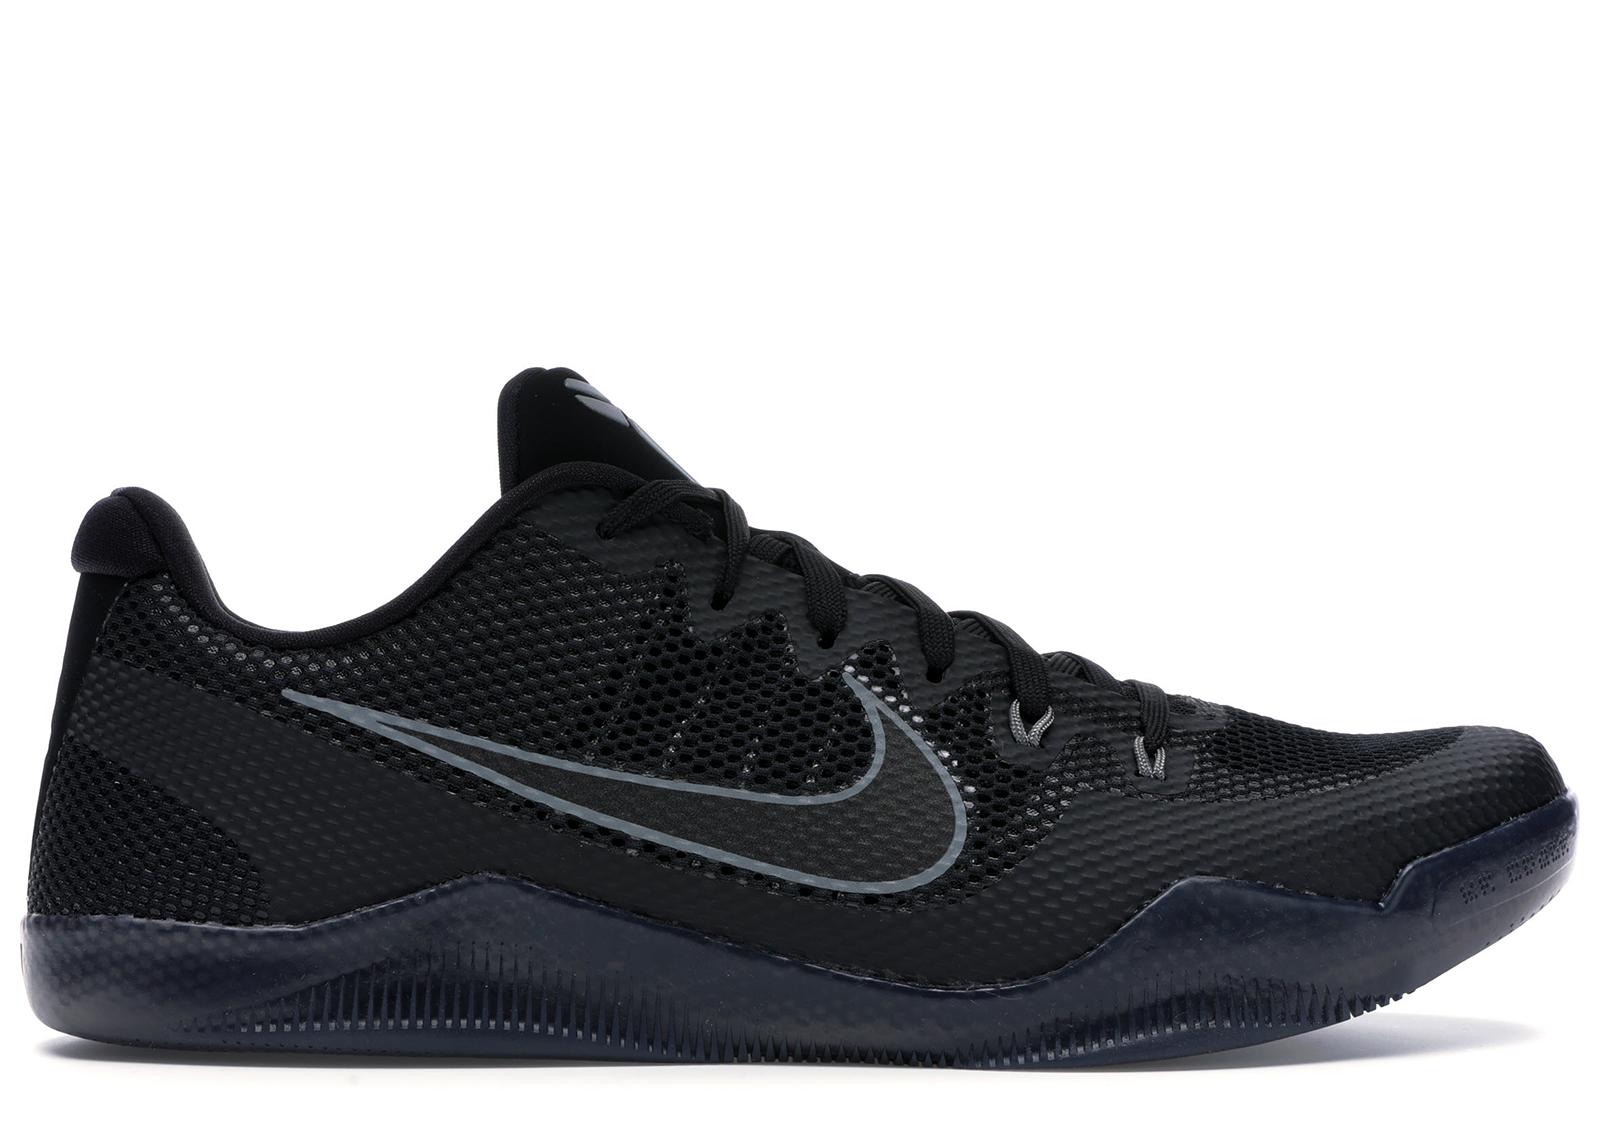 Nike Kobe 11 EM Low Black Cool Grey